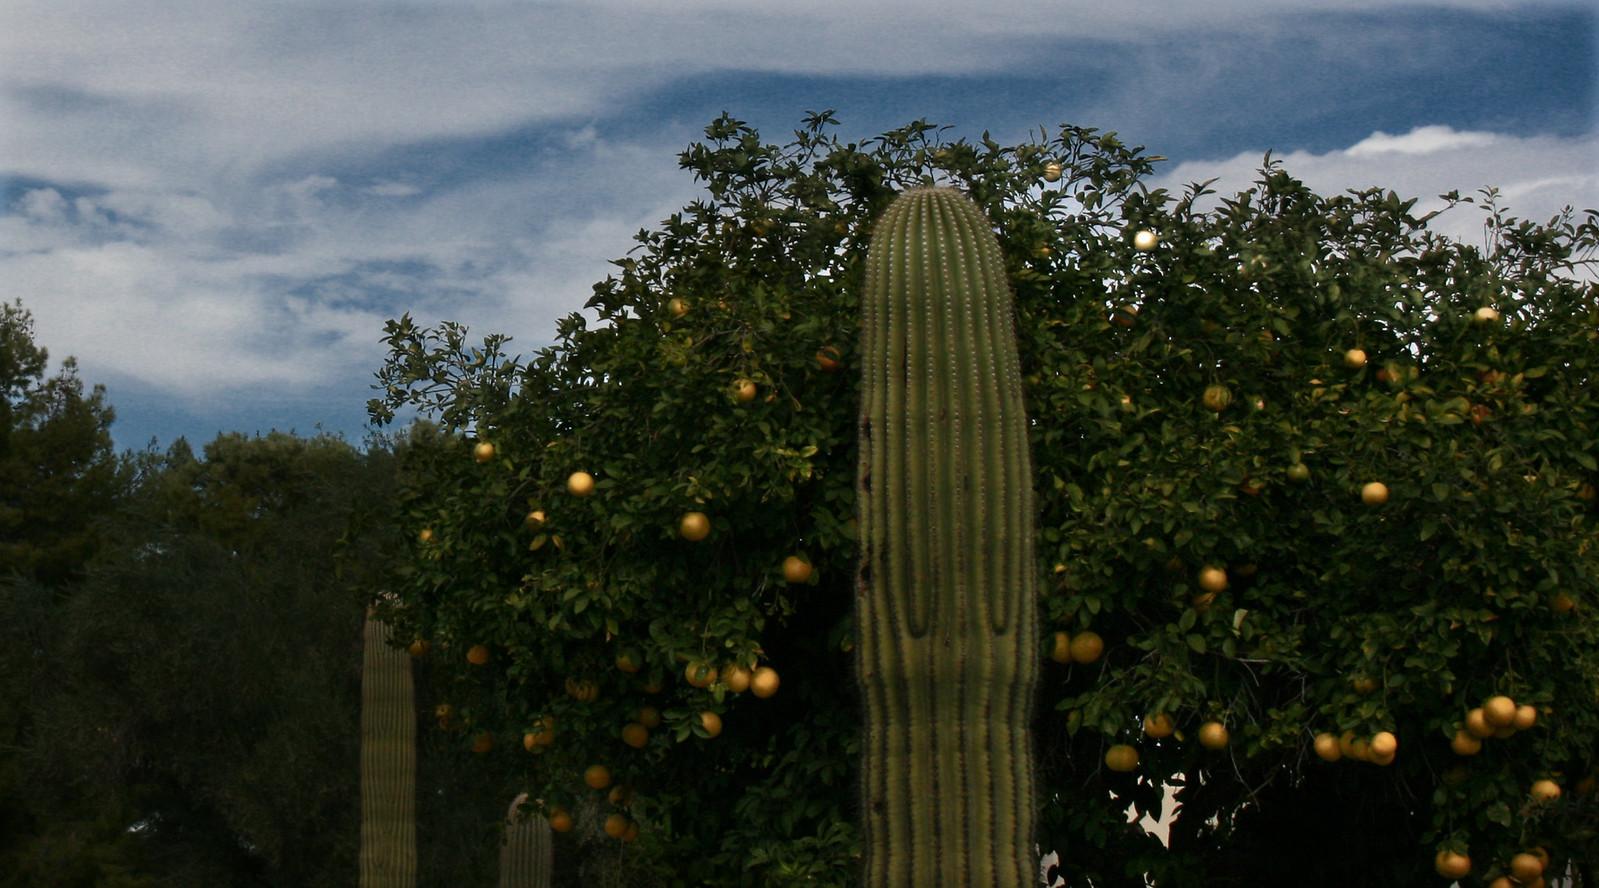 palmcactusoranges